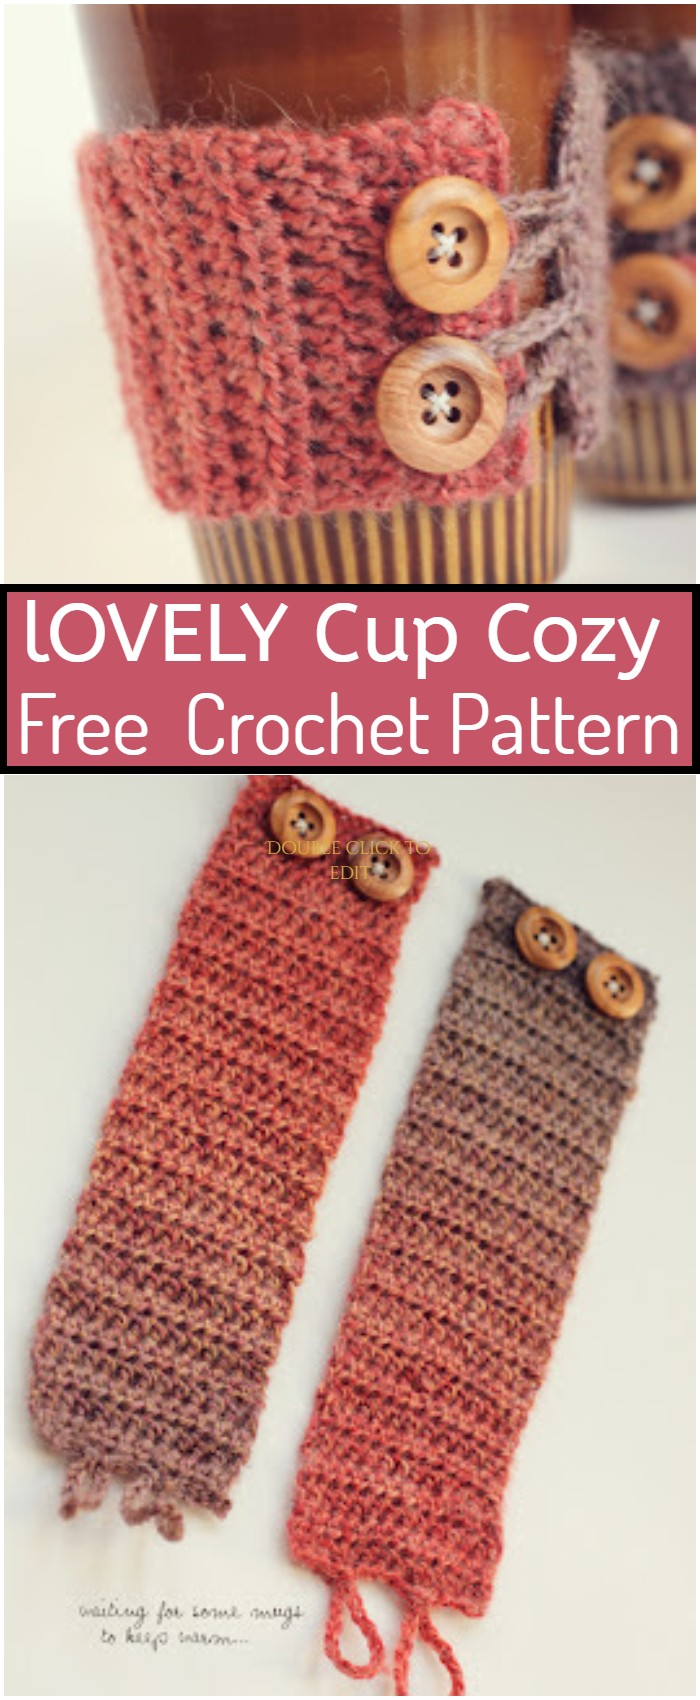 Lovely Cup Cozy Crochet Pattern